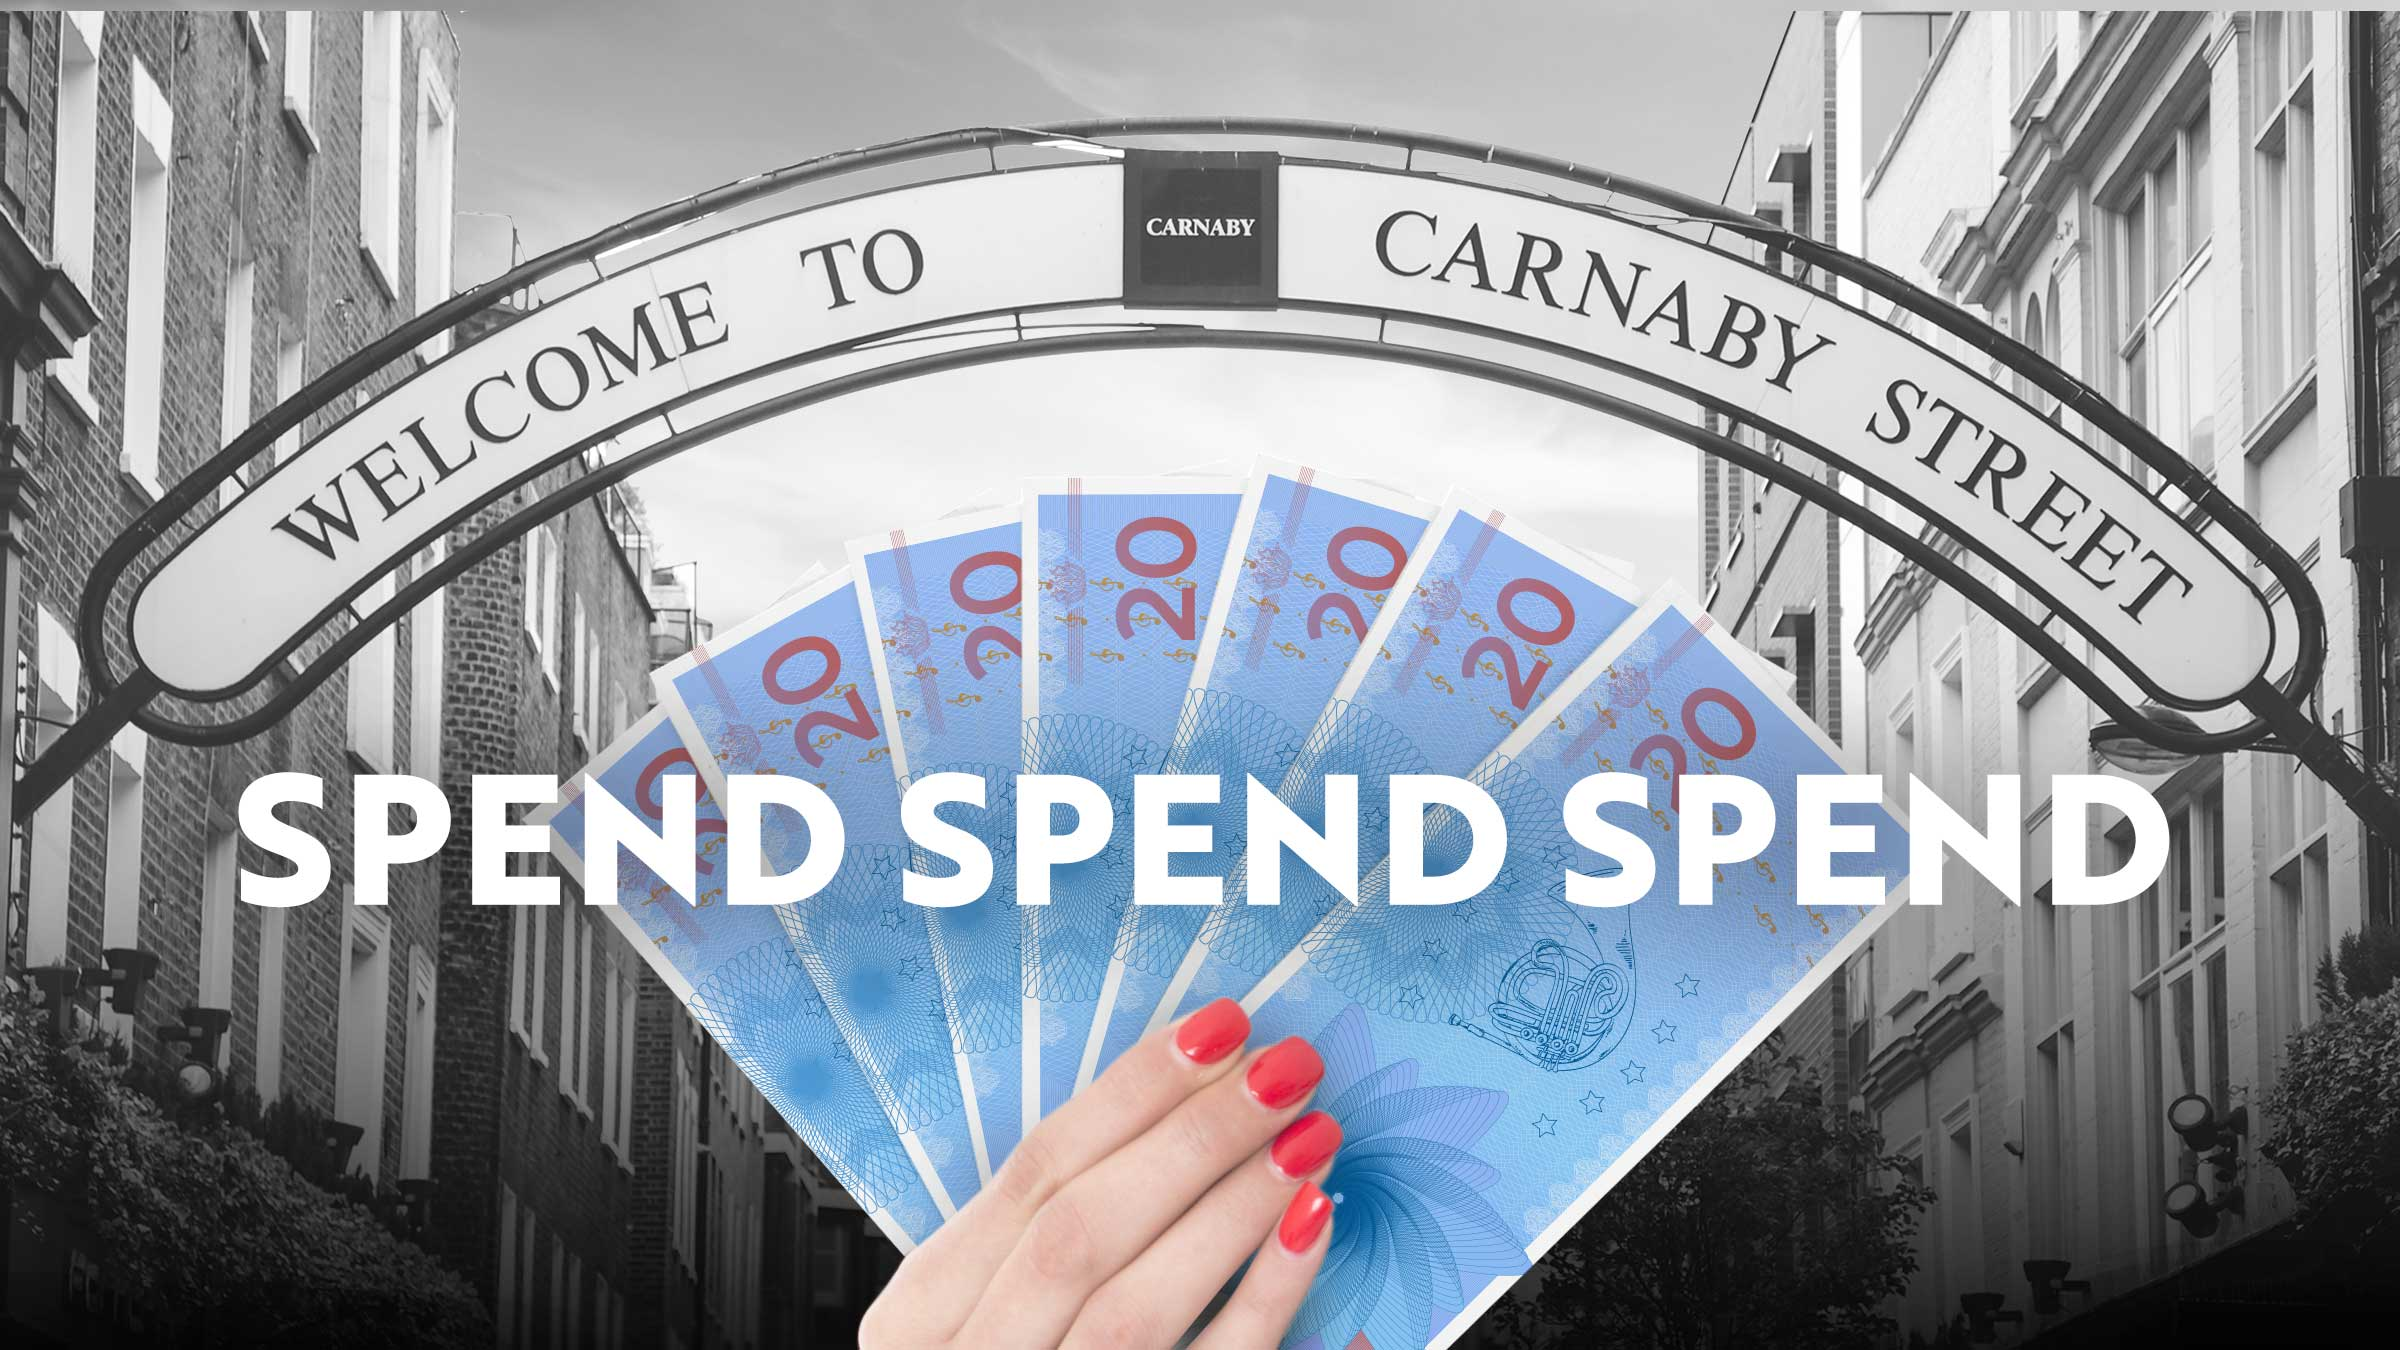 Spend Spend Spend